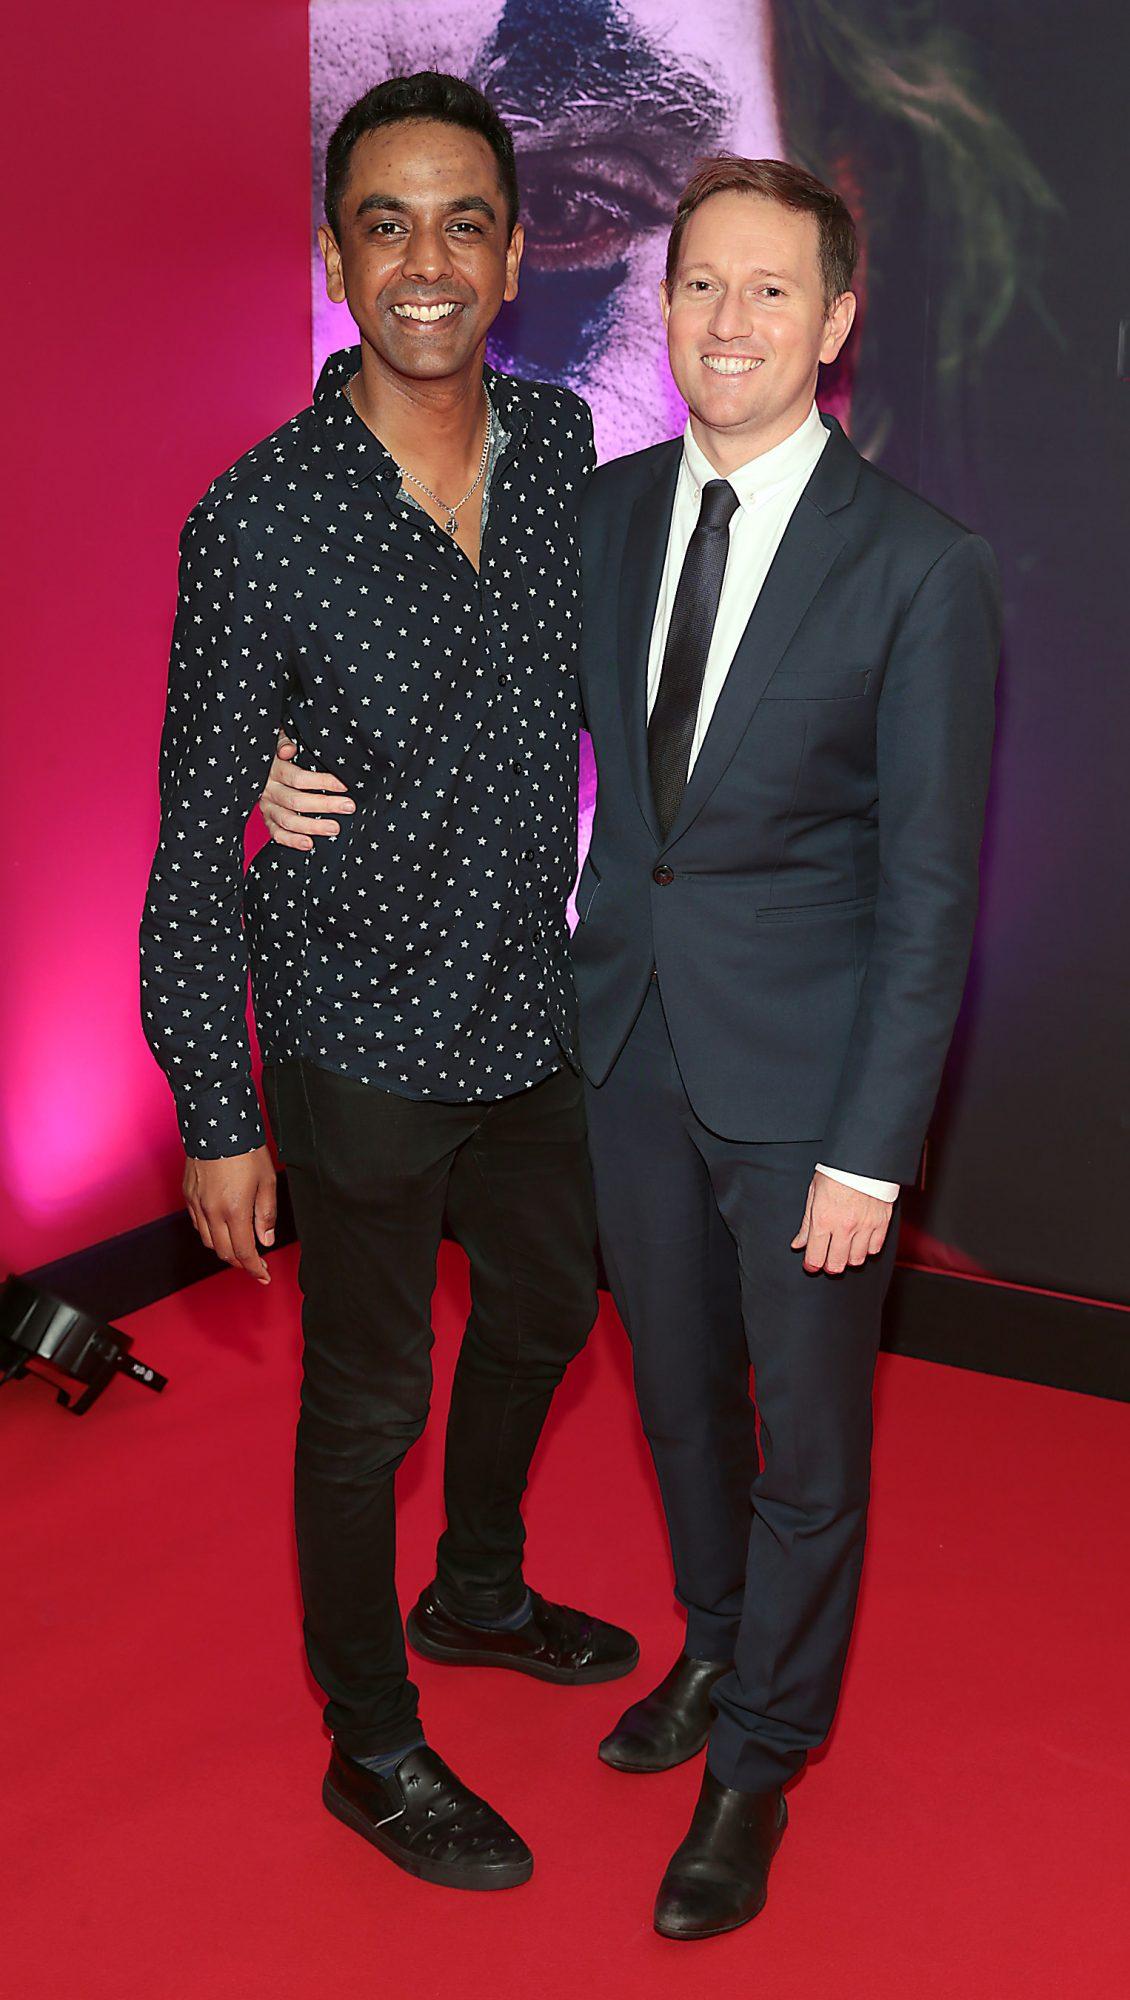 Clint Drieberg and David Mitchell at the Irish Premiere screening of Joker at Cineworld, Dublin. Pic: Brian McEvoy.